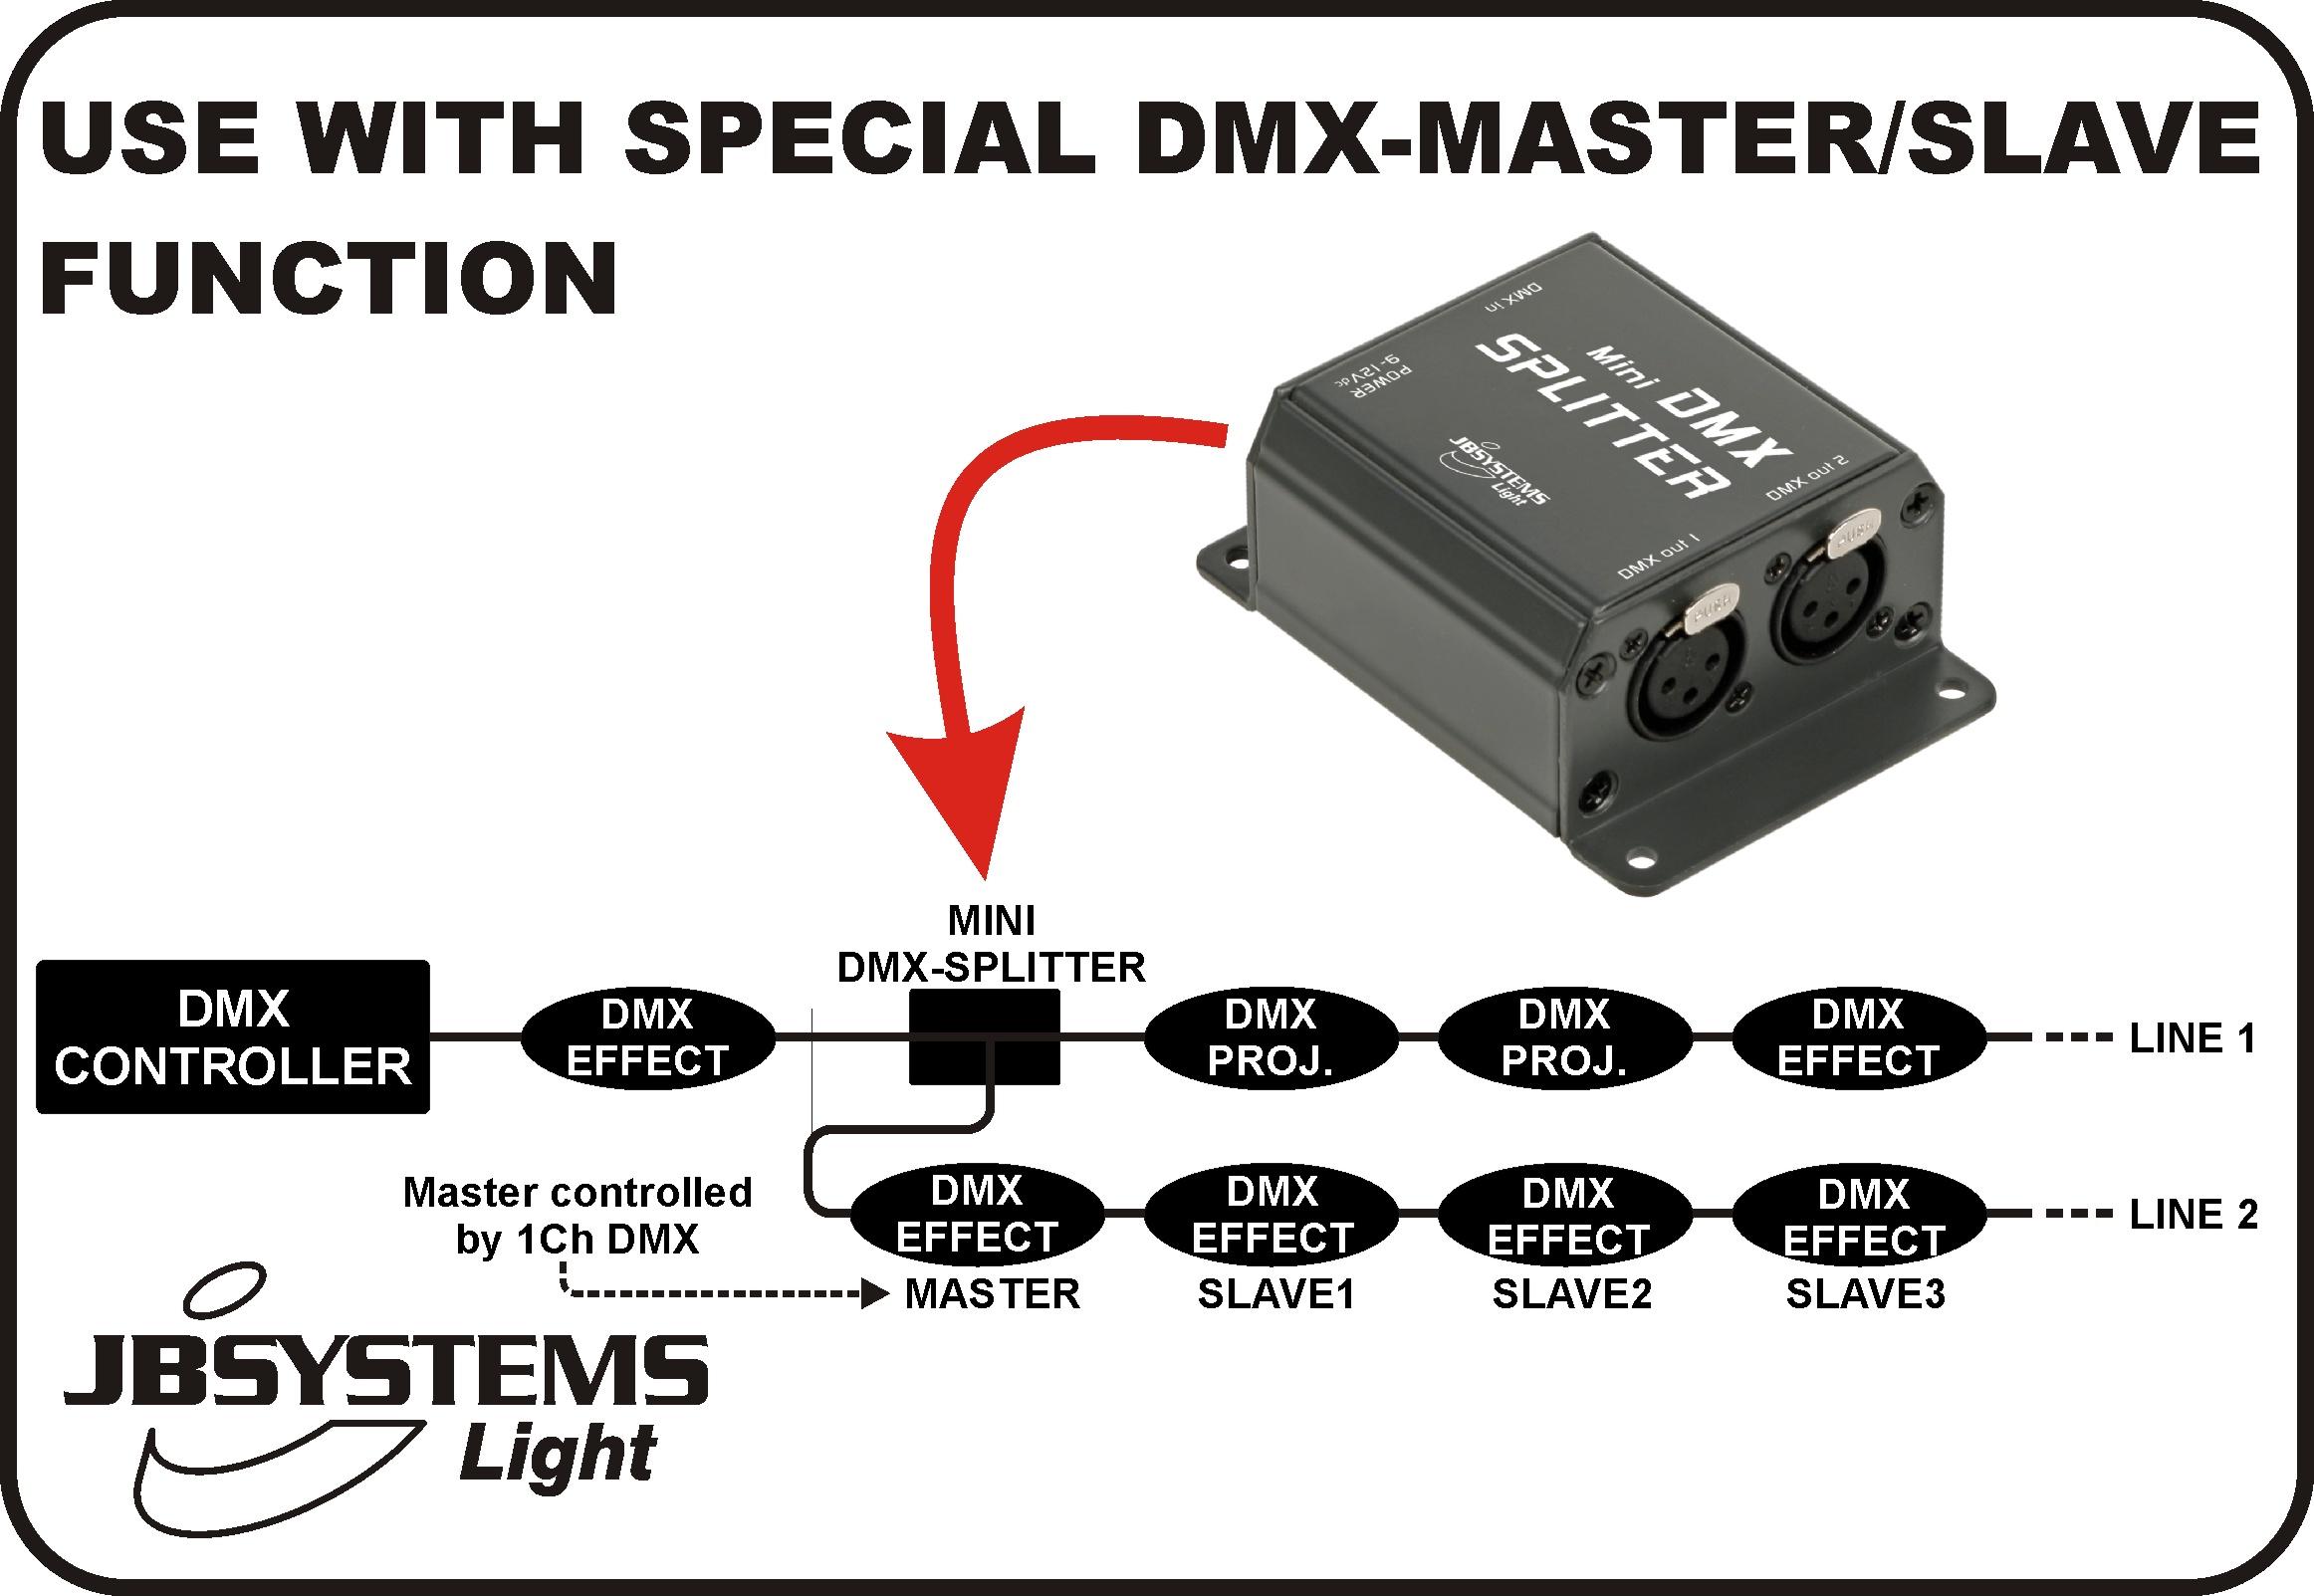 jb systems mini dmx splitter licht steuerung. Black Bedroom Furniture Sets. Home Design Ideas